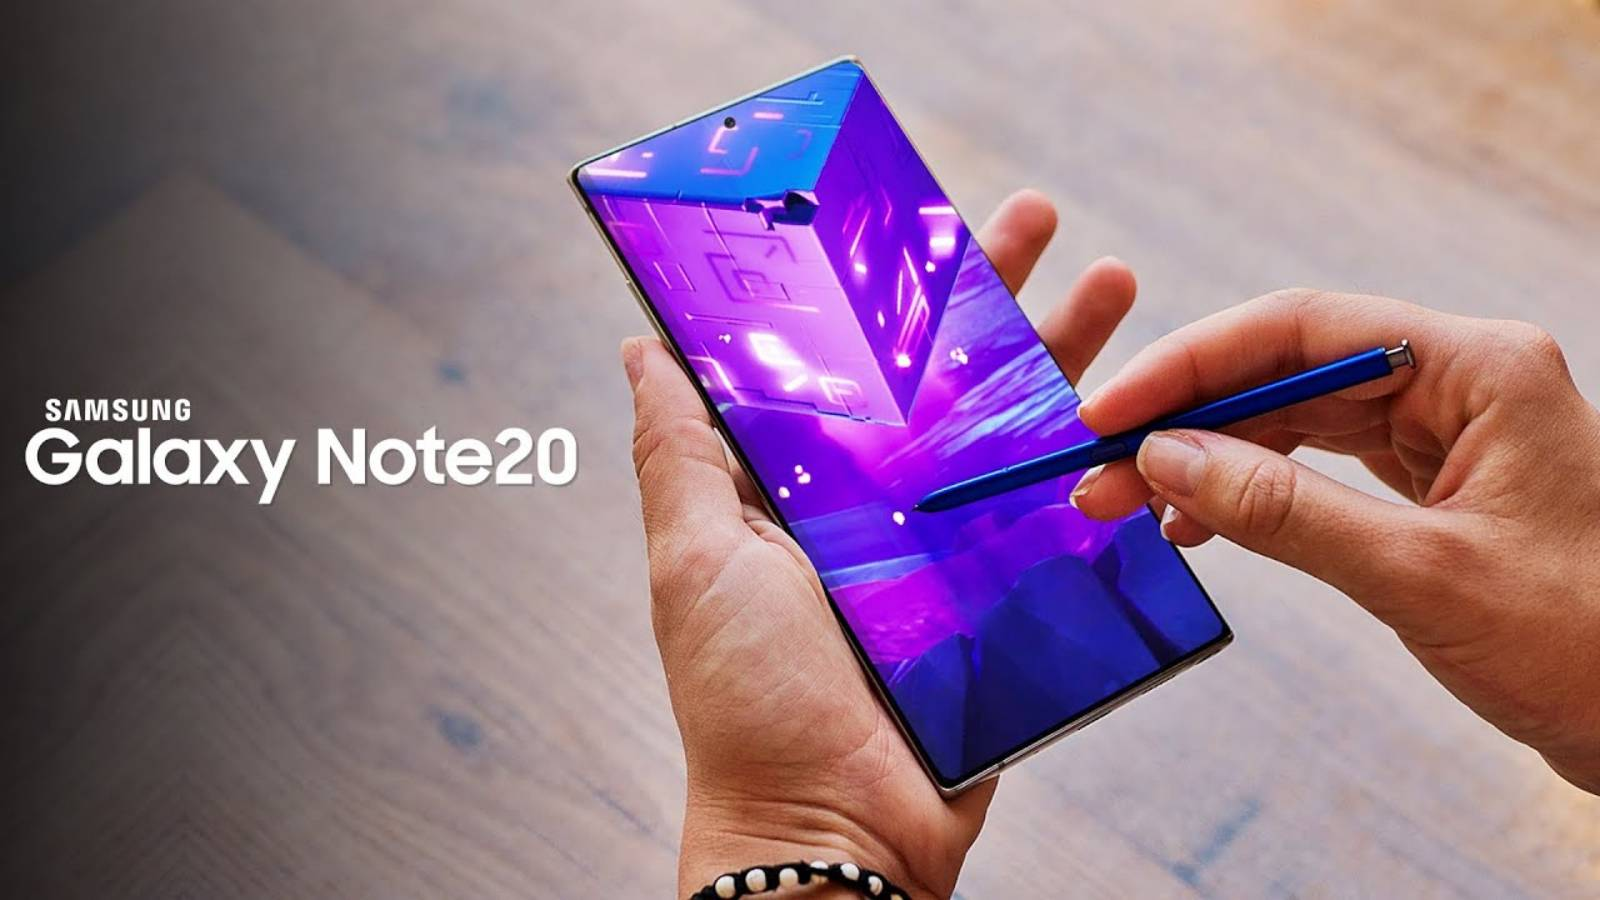 Samsung GALAXY Note 20 ULTRA premium